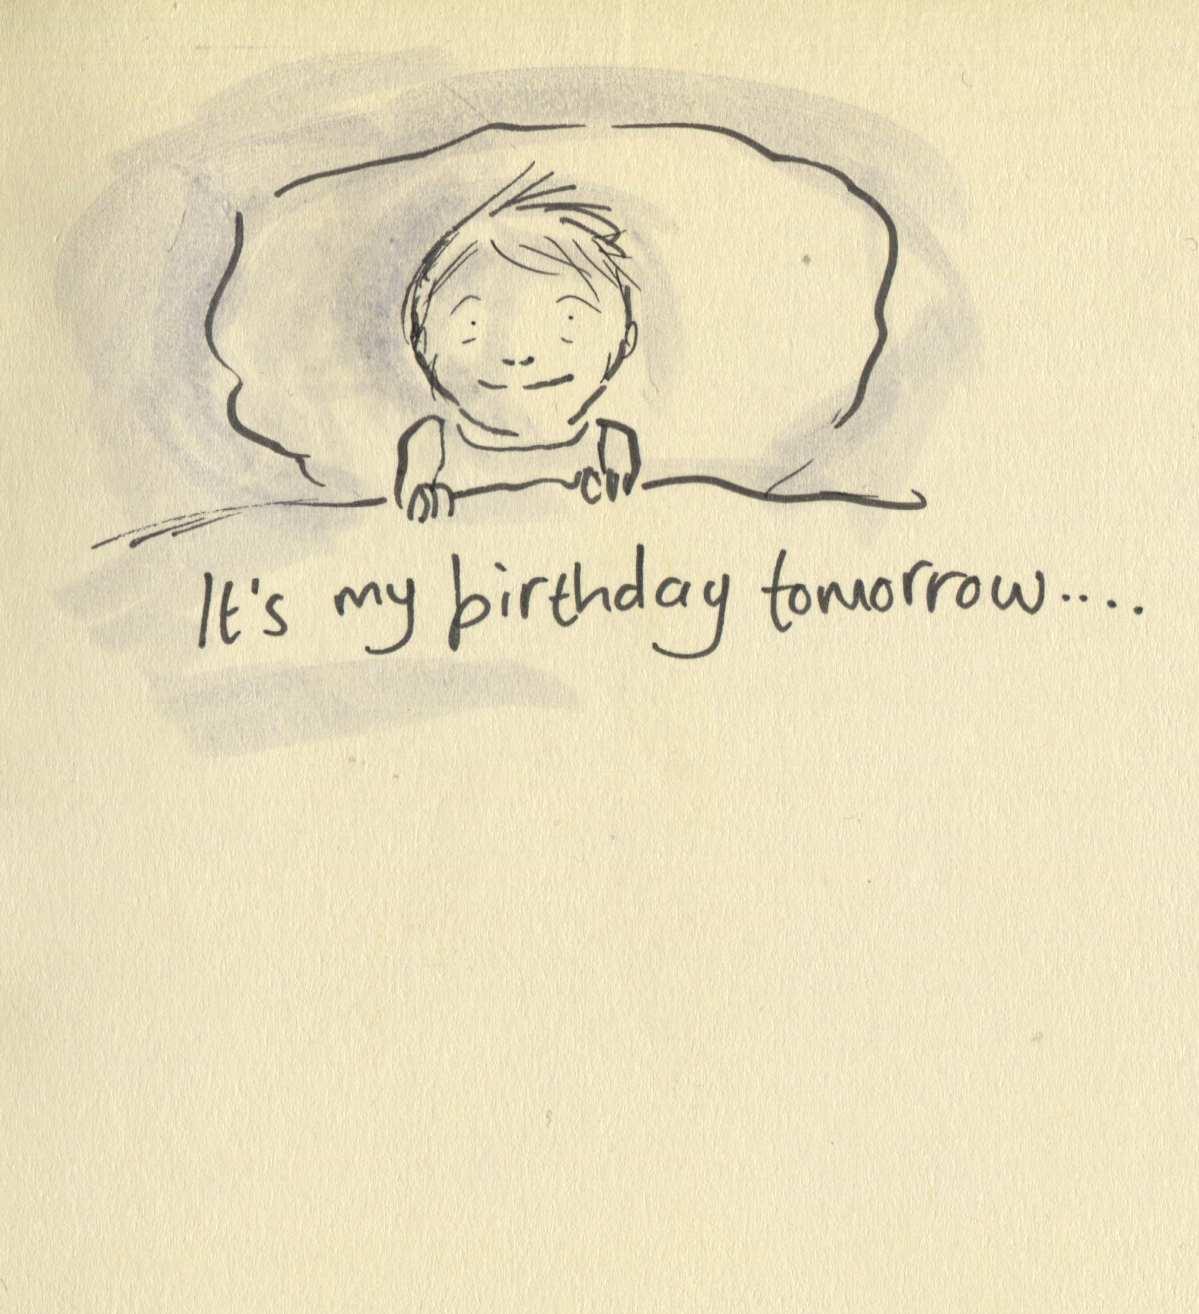 birthday eve Birthday eve. | Doodlemum birthday eve